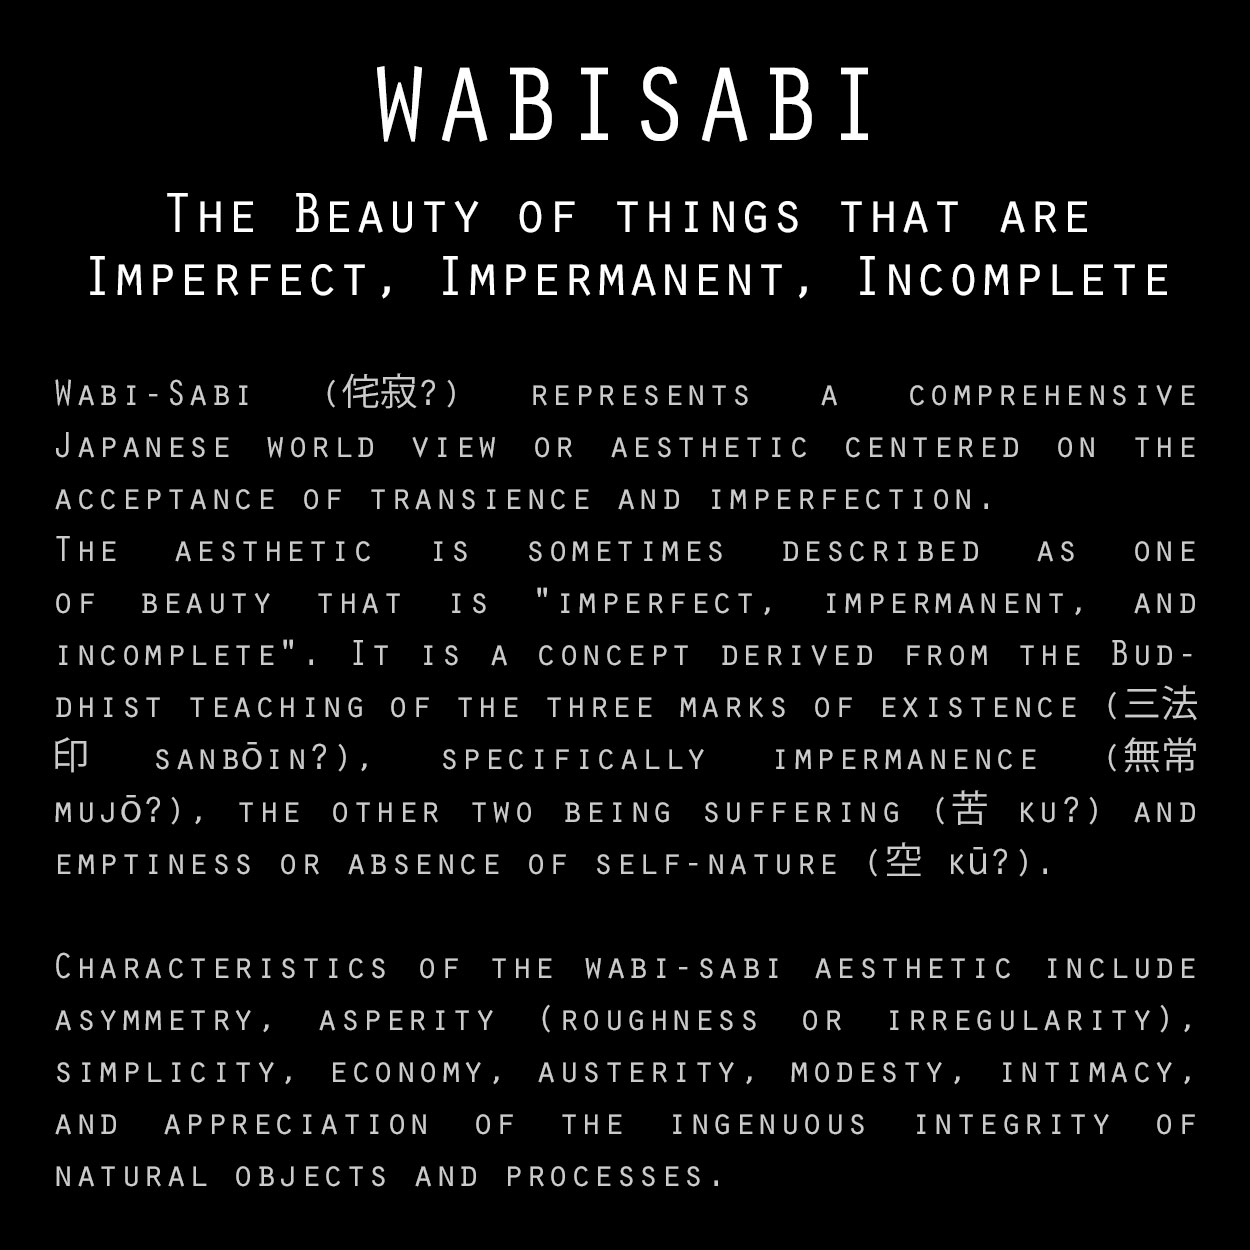 wabi sabi explanation.jpg